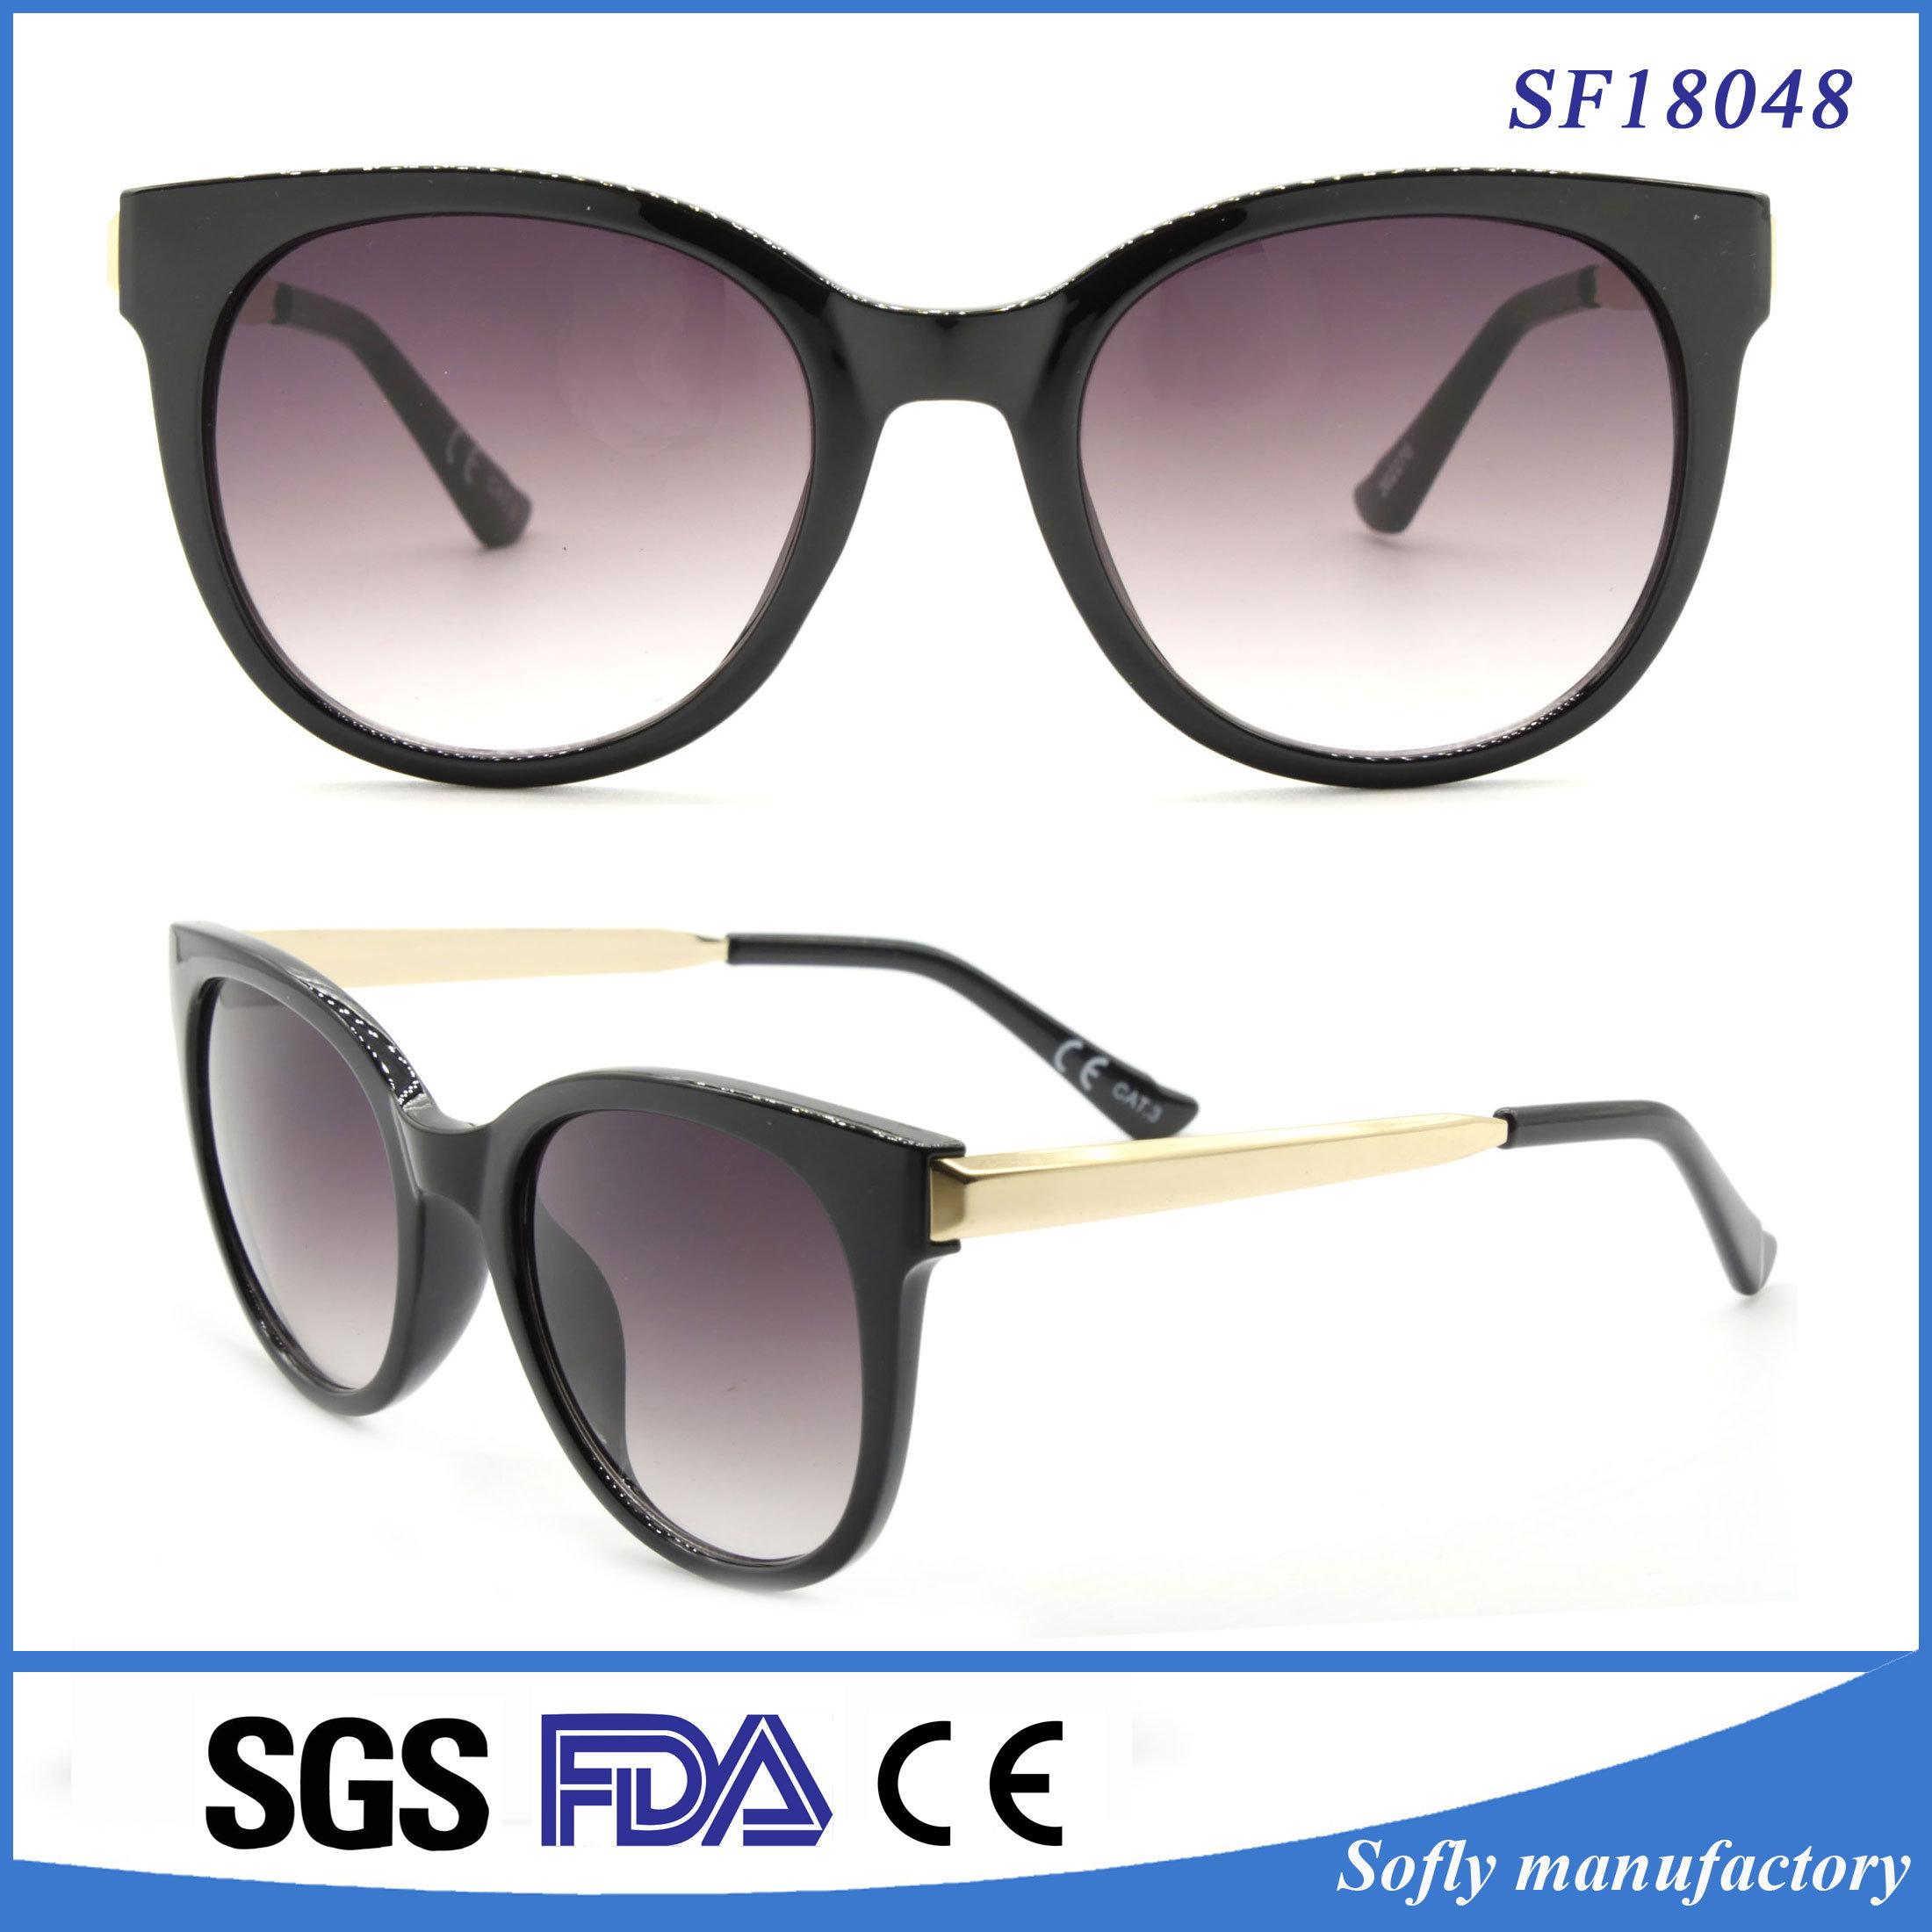 2dd618eb9638 China Big Black Cat Eyes Frame Sunglasses with Metal Temple for Women -  China Original Brand Sunglasses